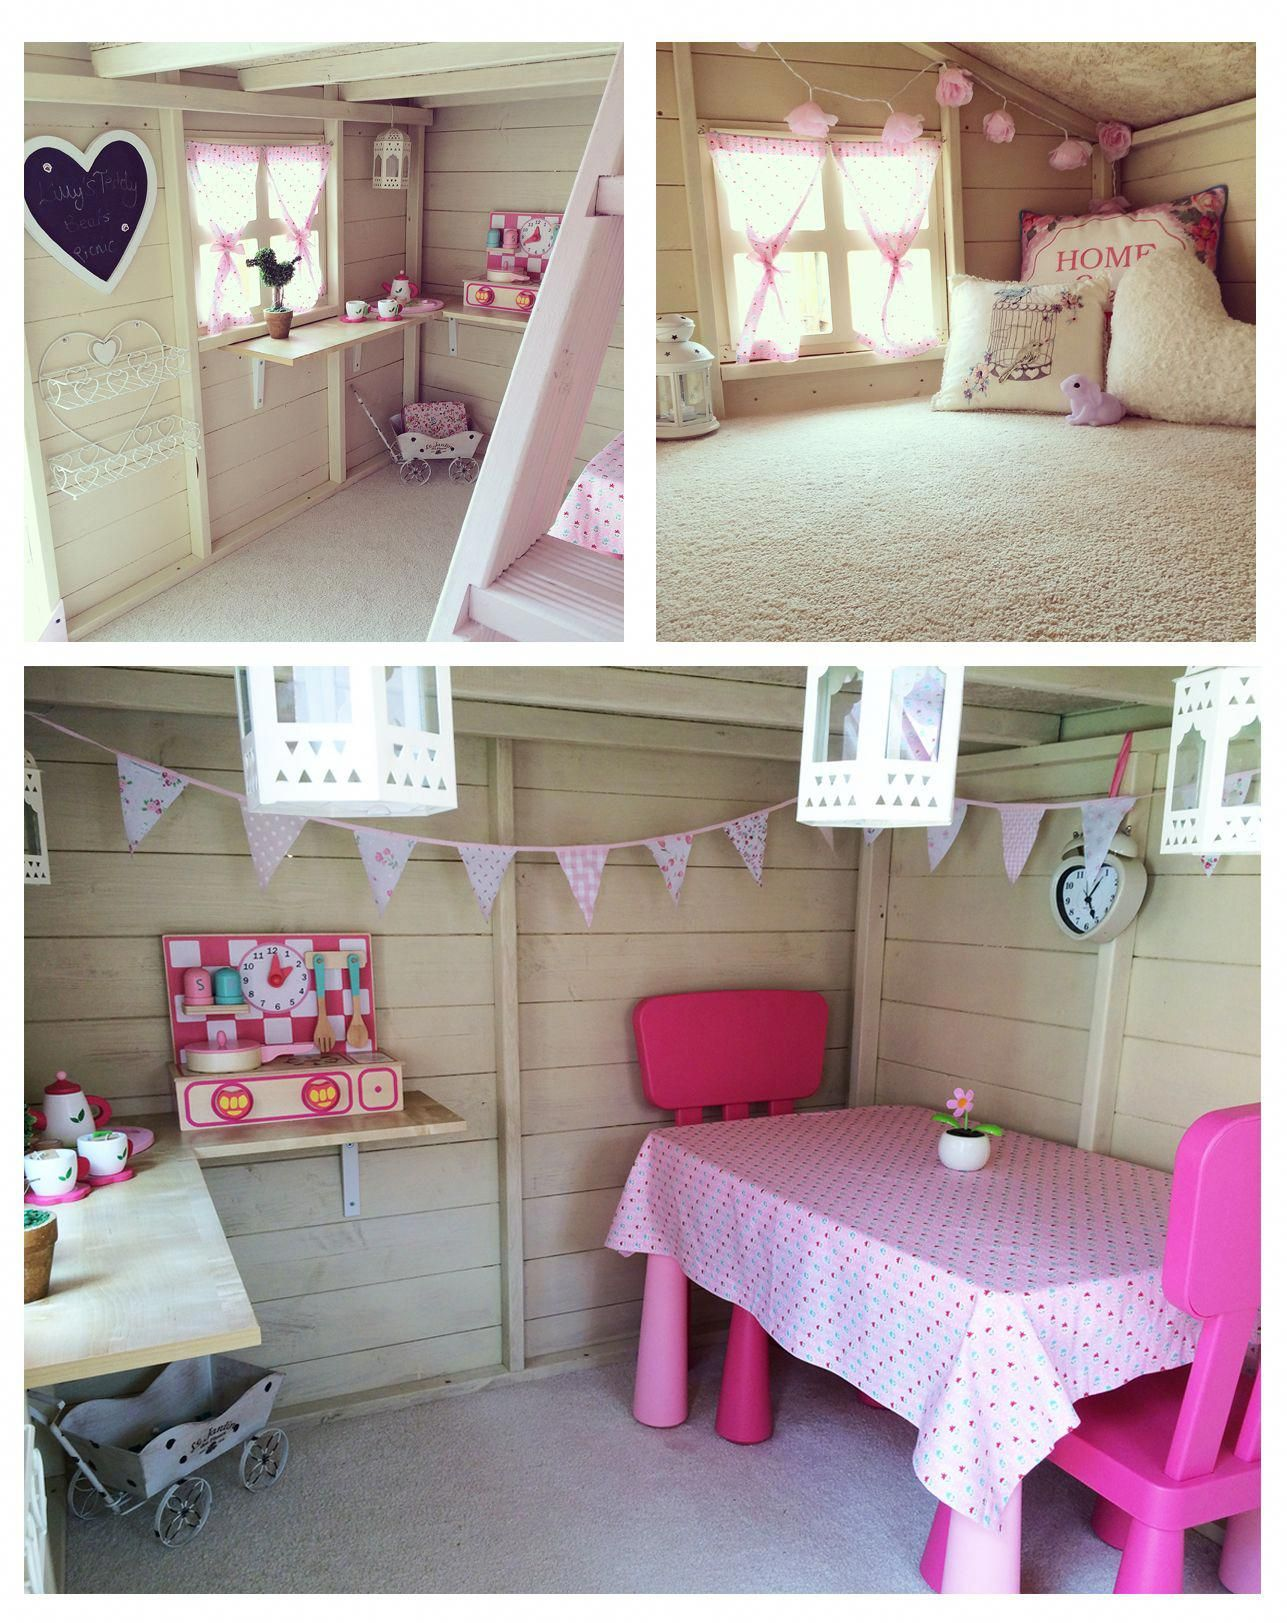 Playhouse interior decor ideas for girls more topinteriordesignanddecor also  top design and rh pinterest